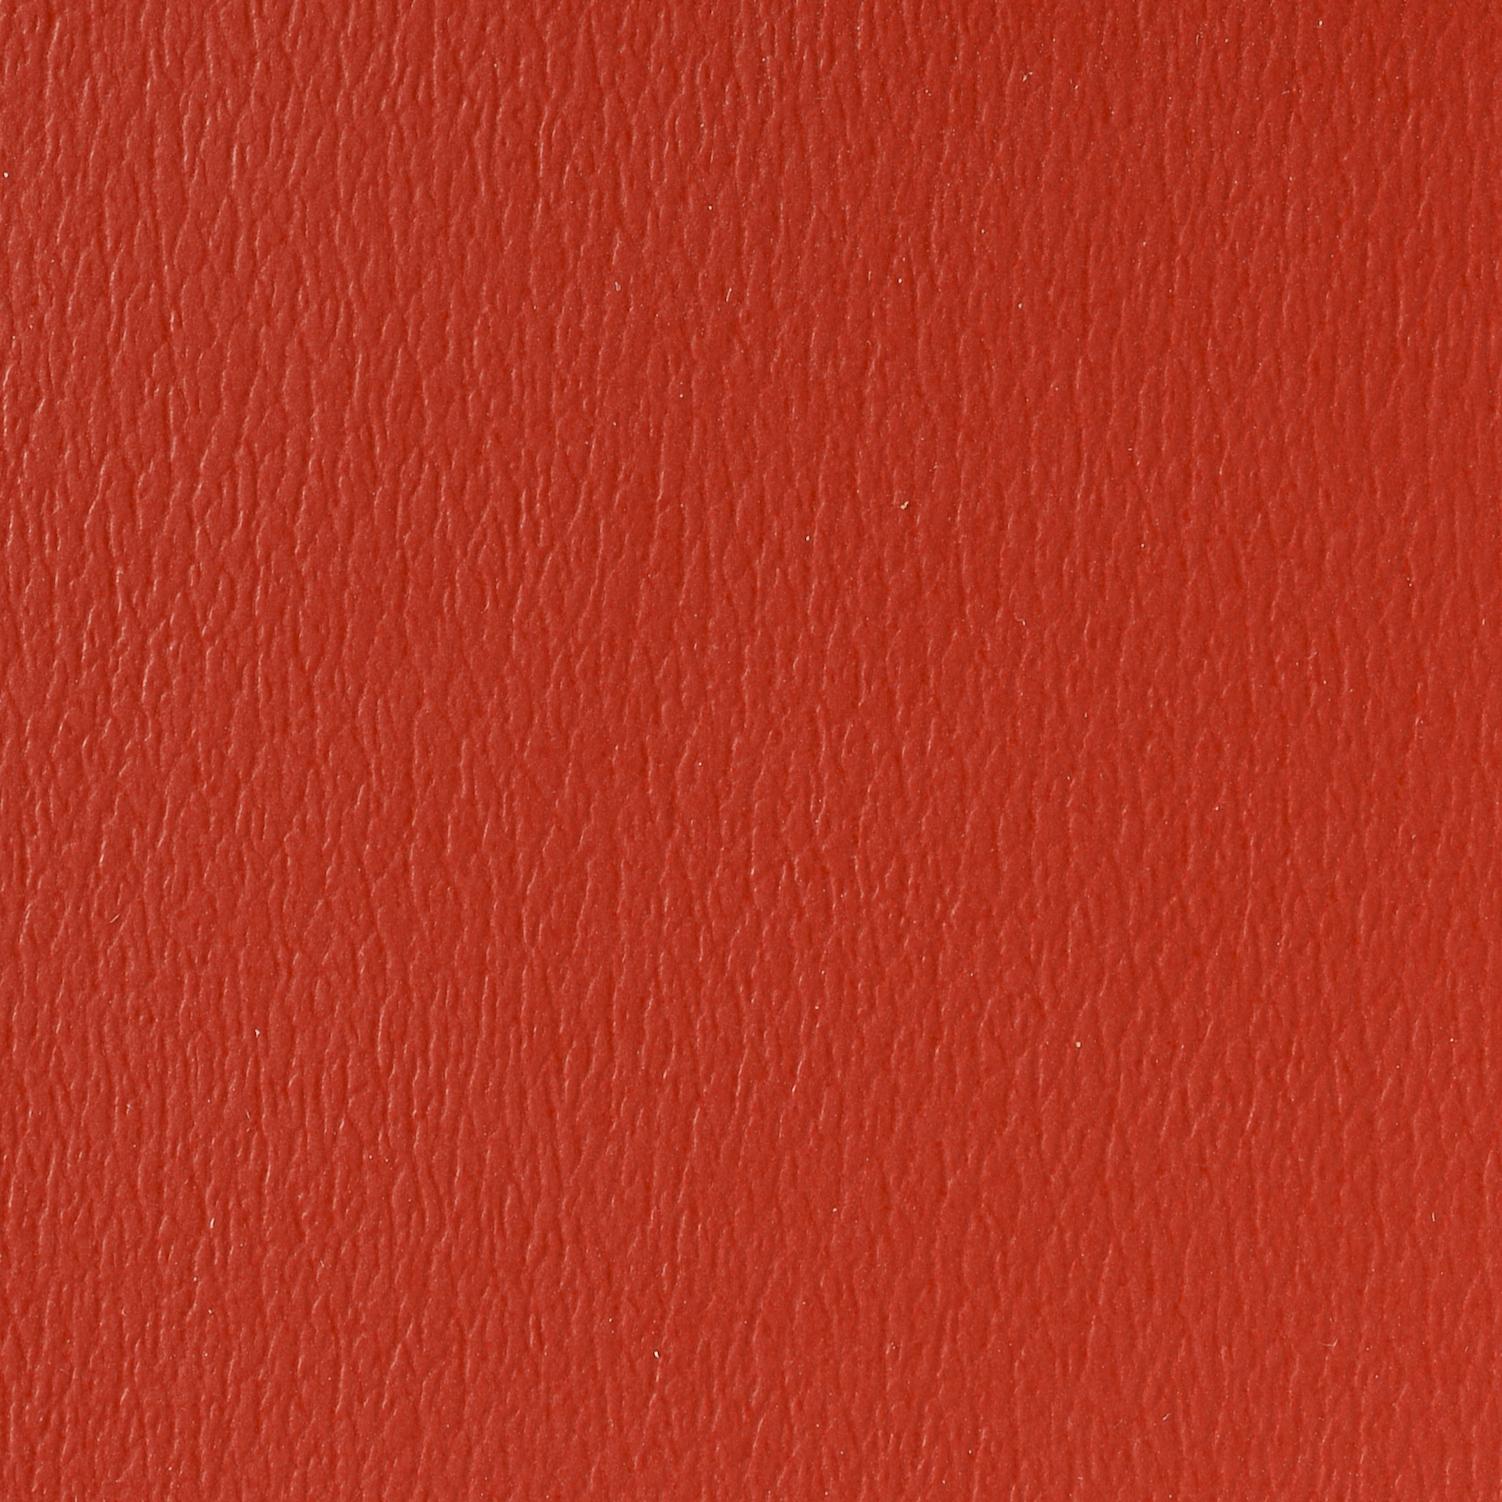 SIGNAL RED   PH-44